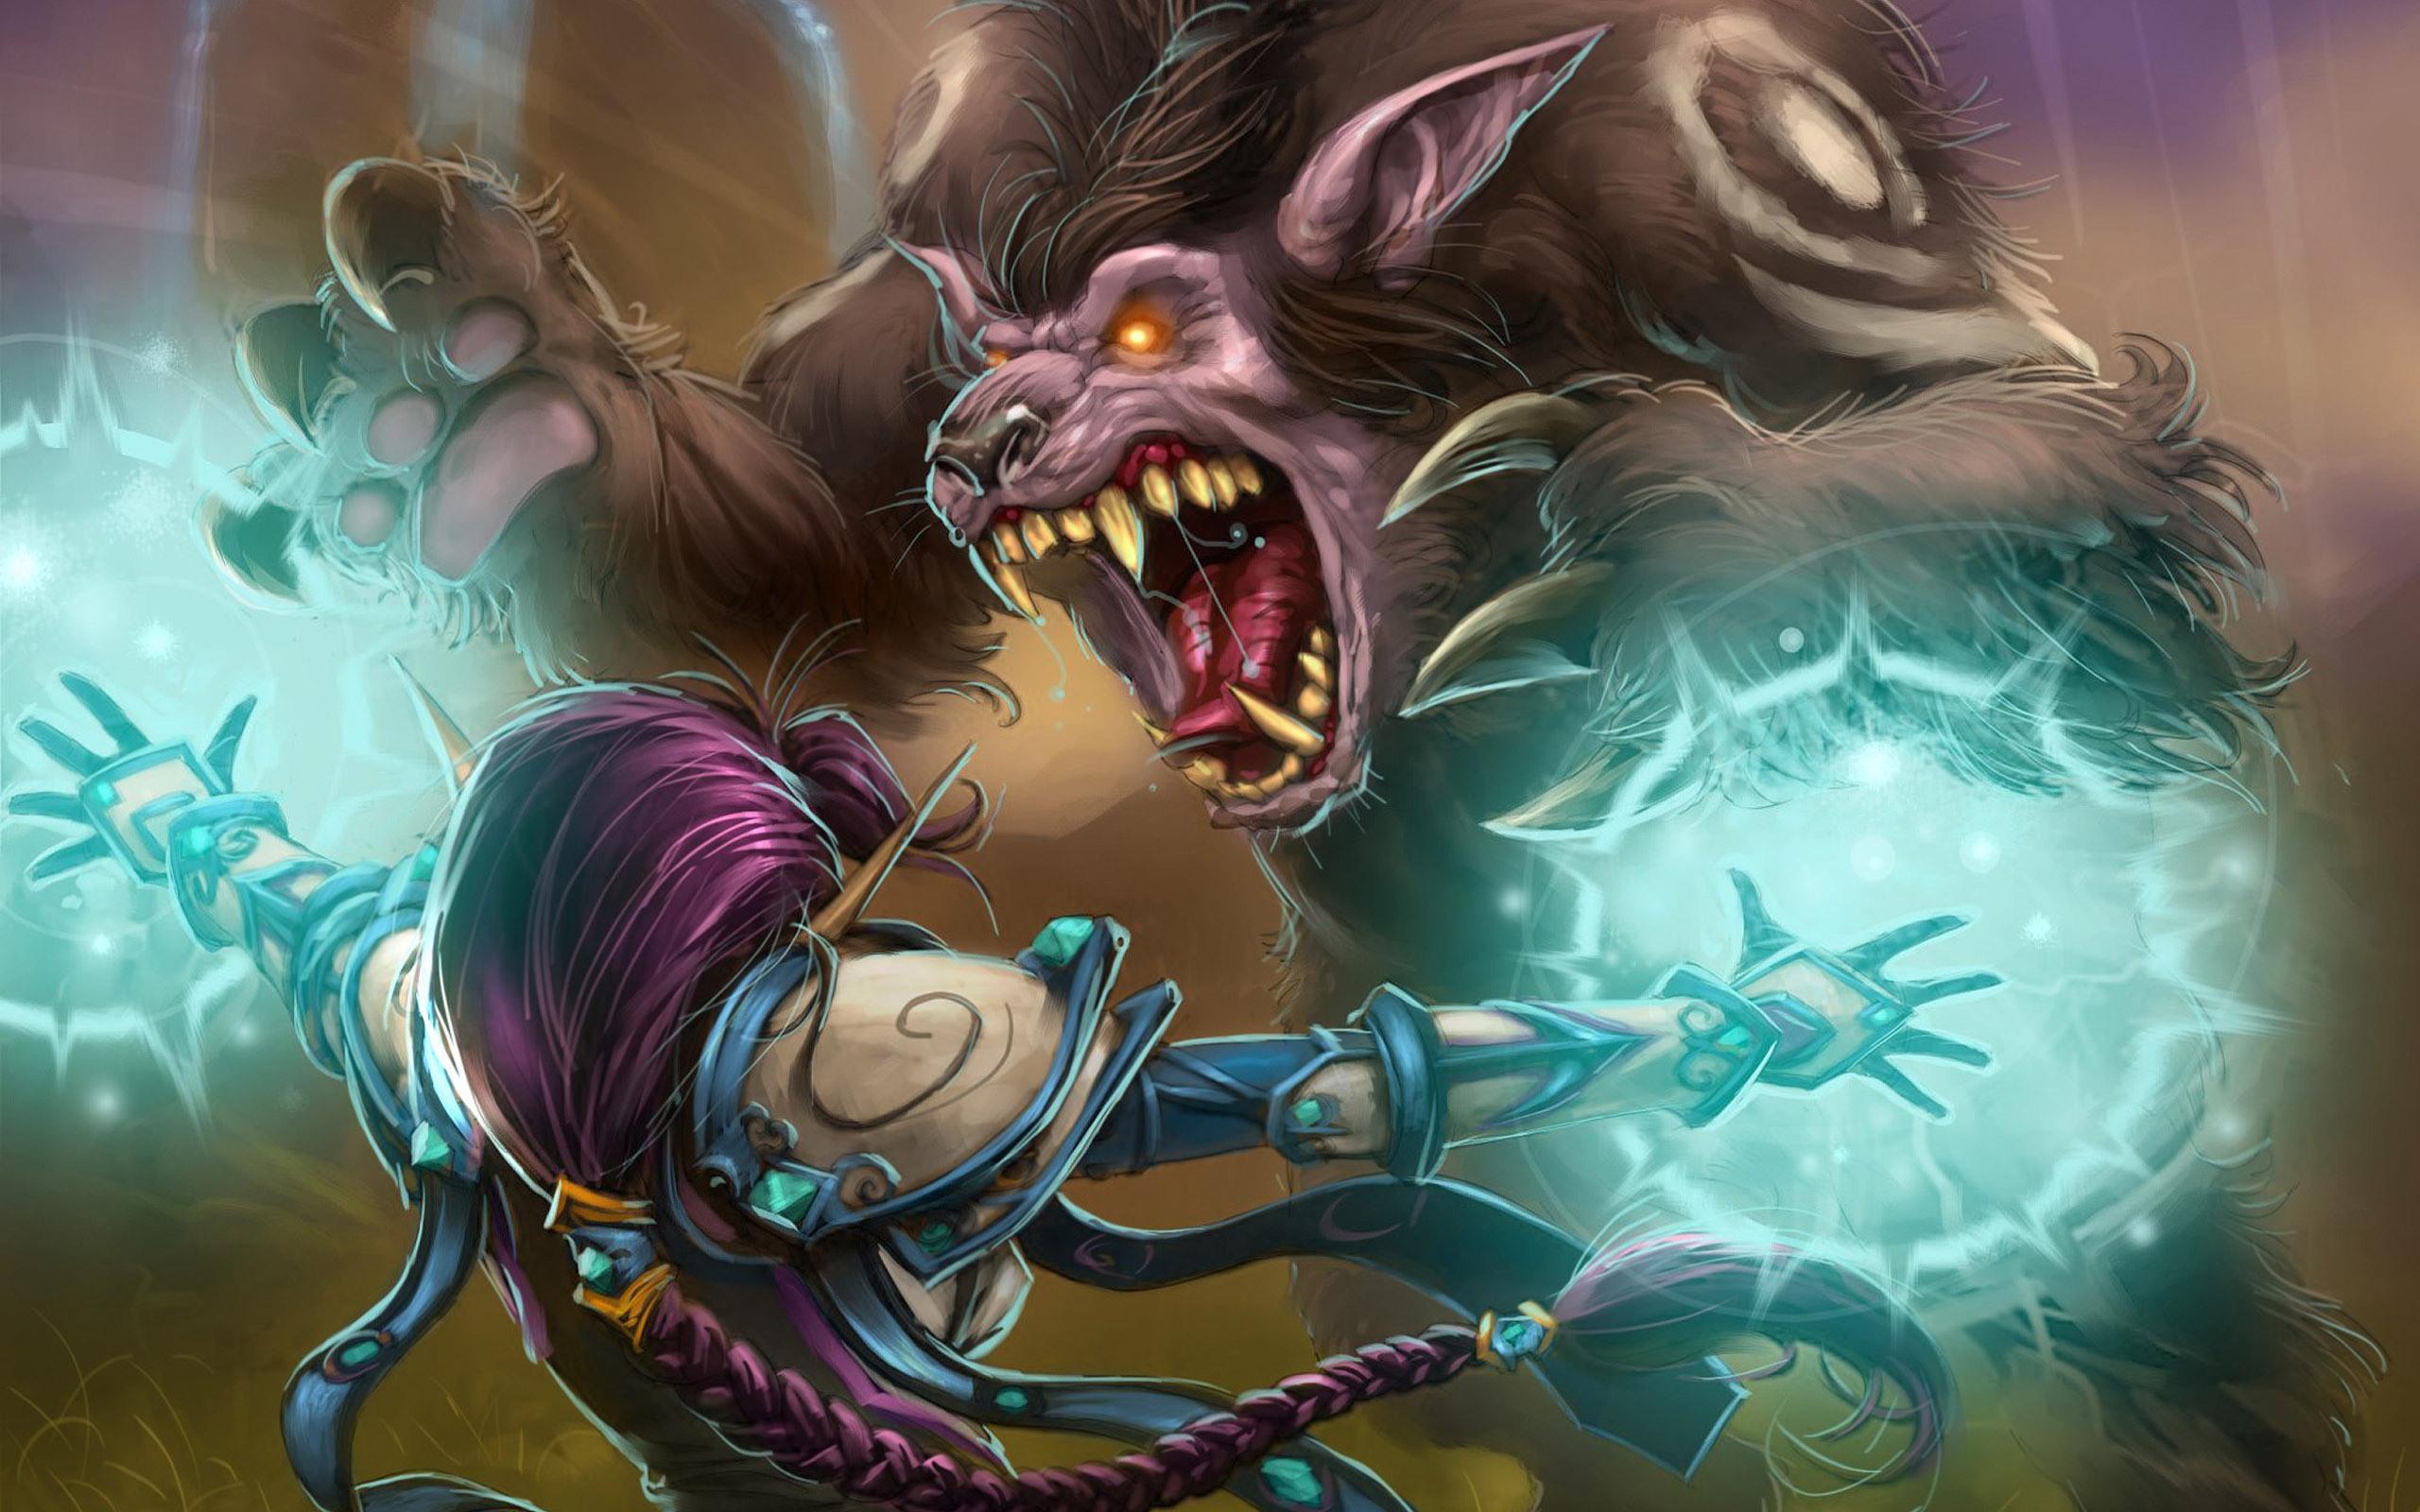 World of Warcraft   Druid Attack desktop wallpaper 2560x1600